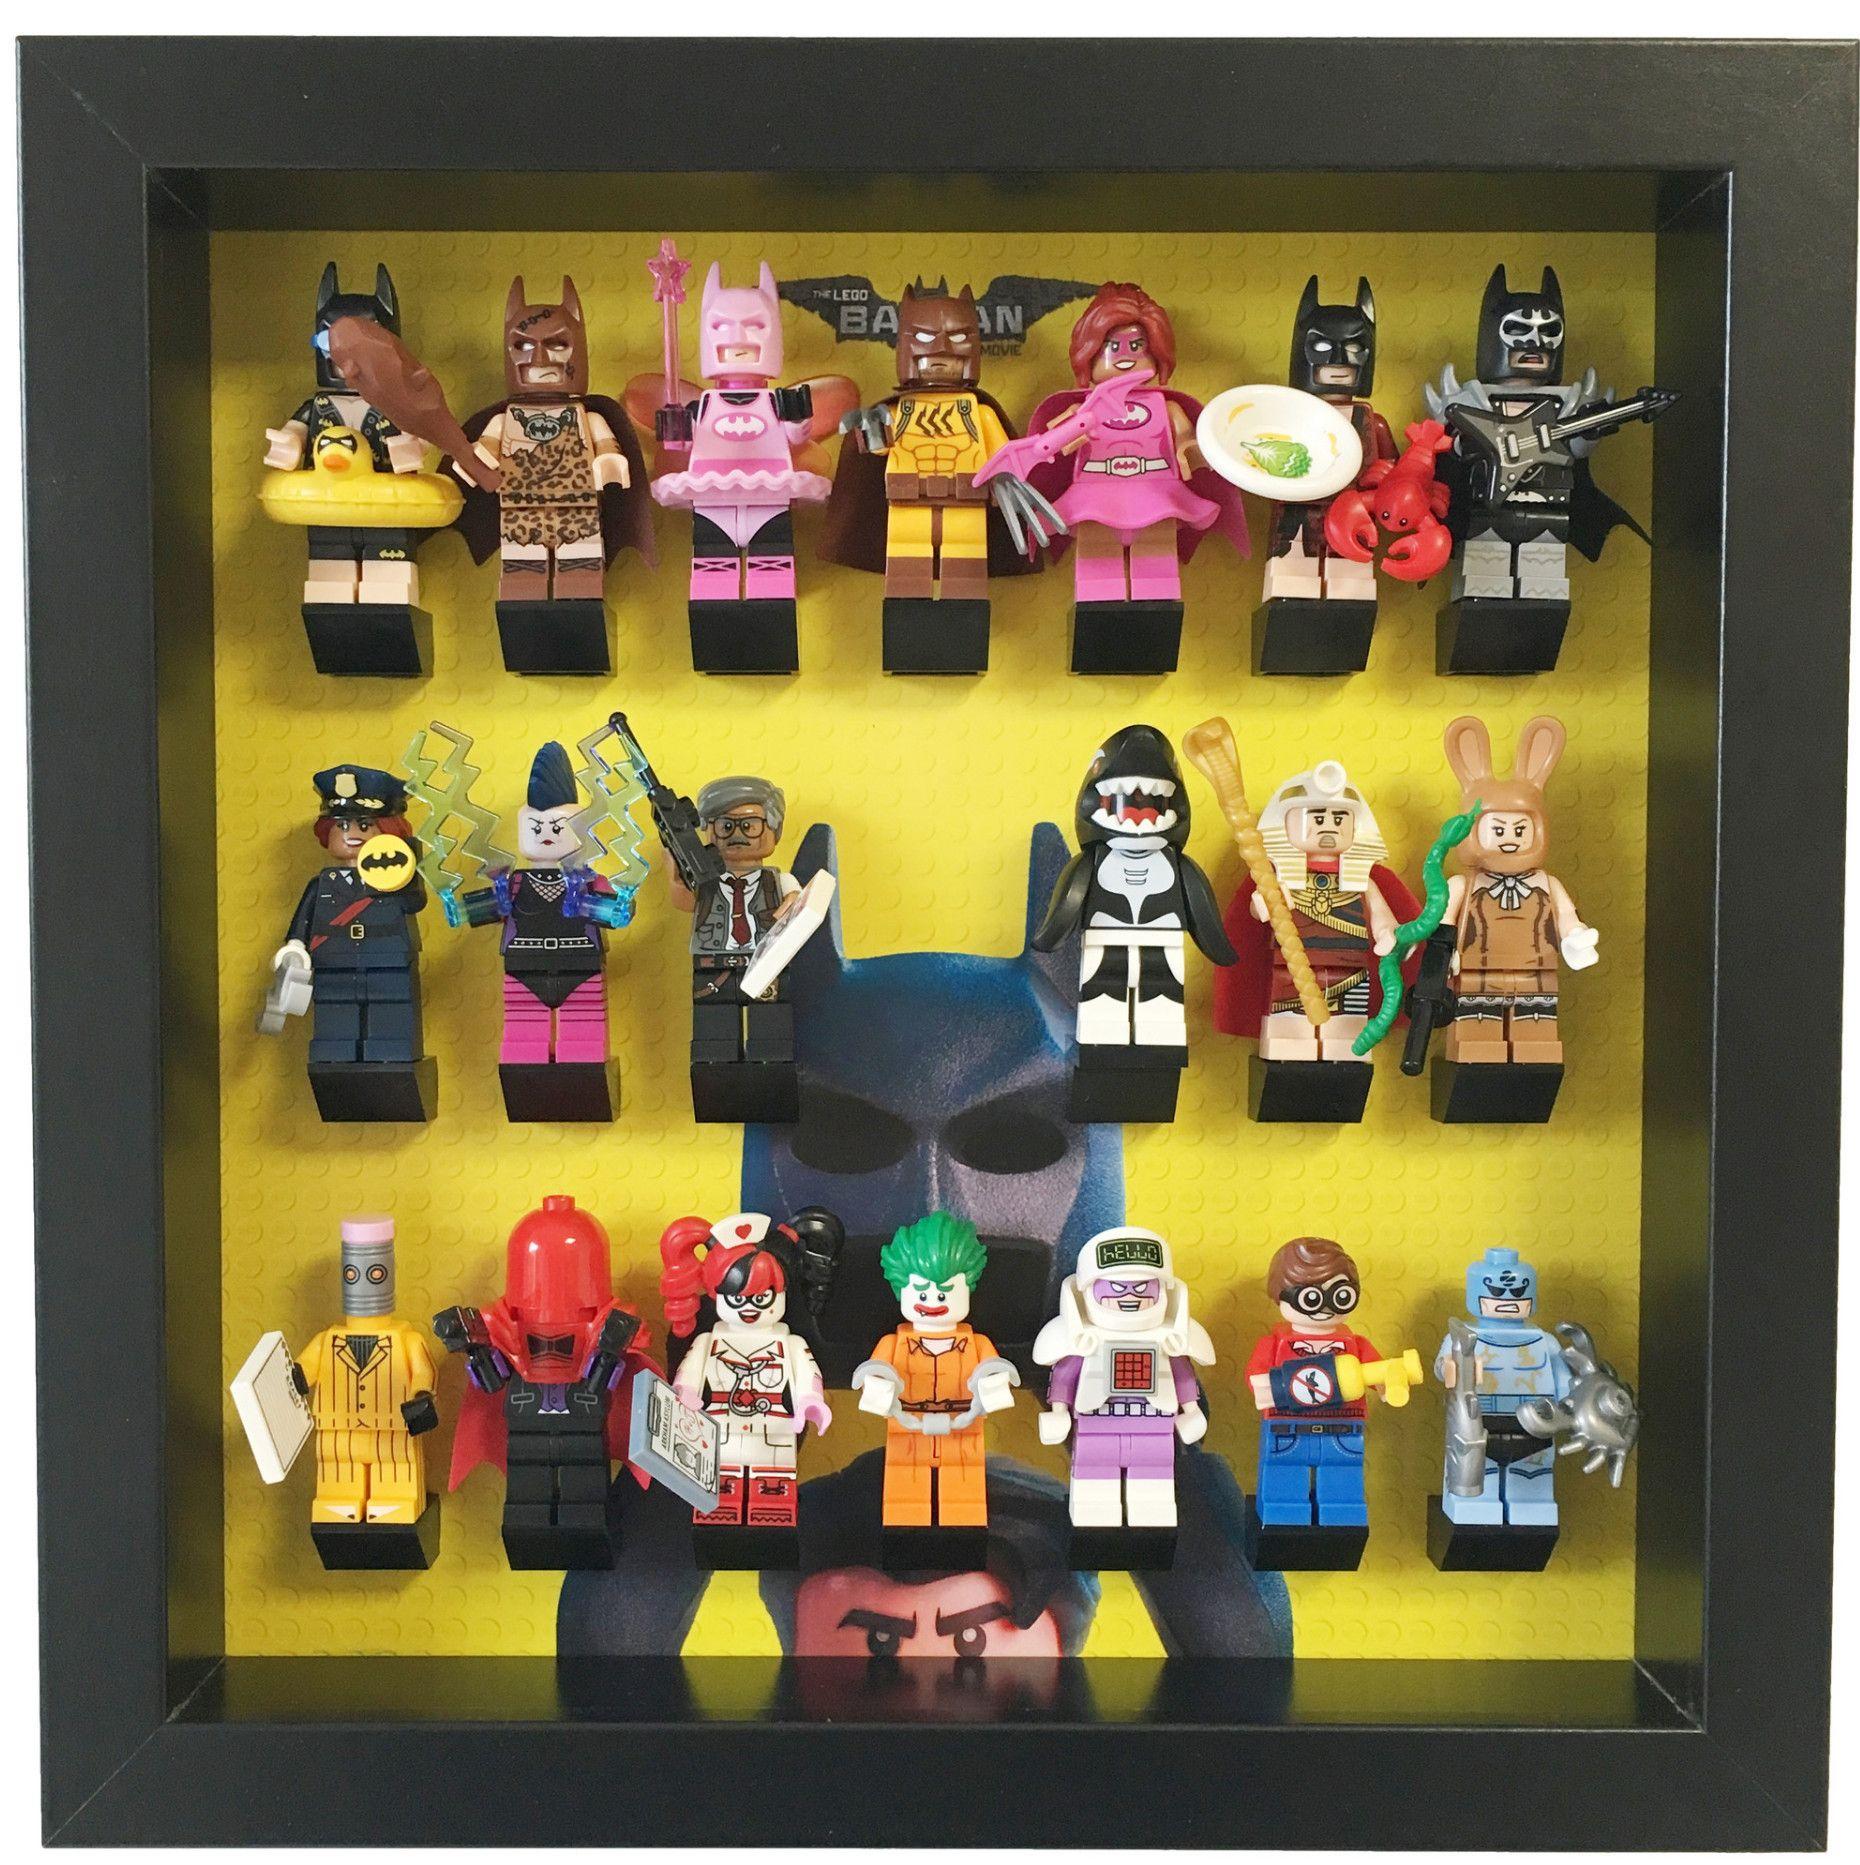 The Lego Batman Movie Minifigures frame